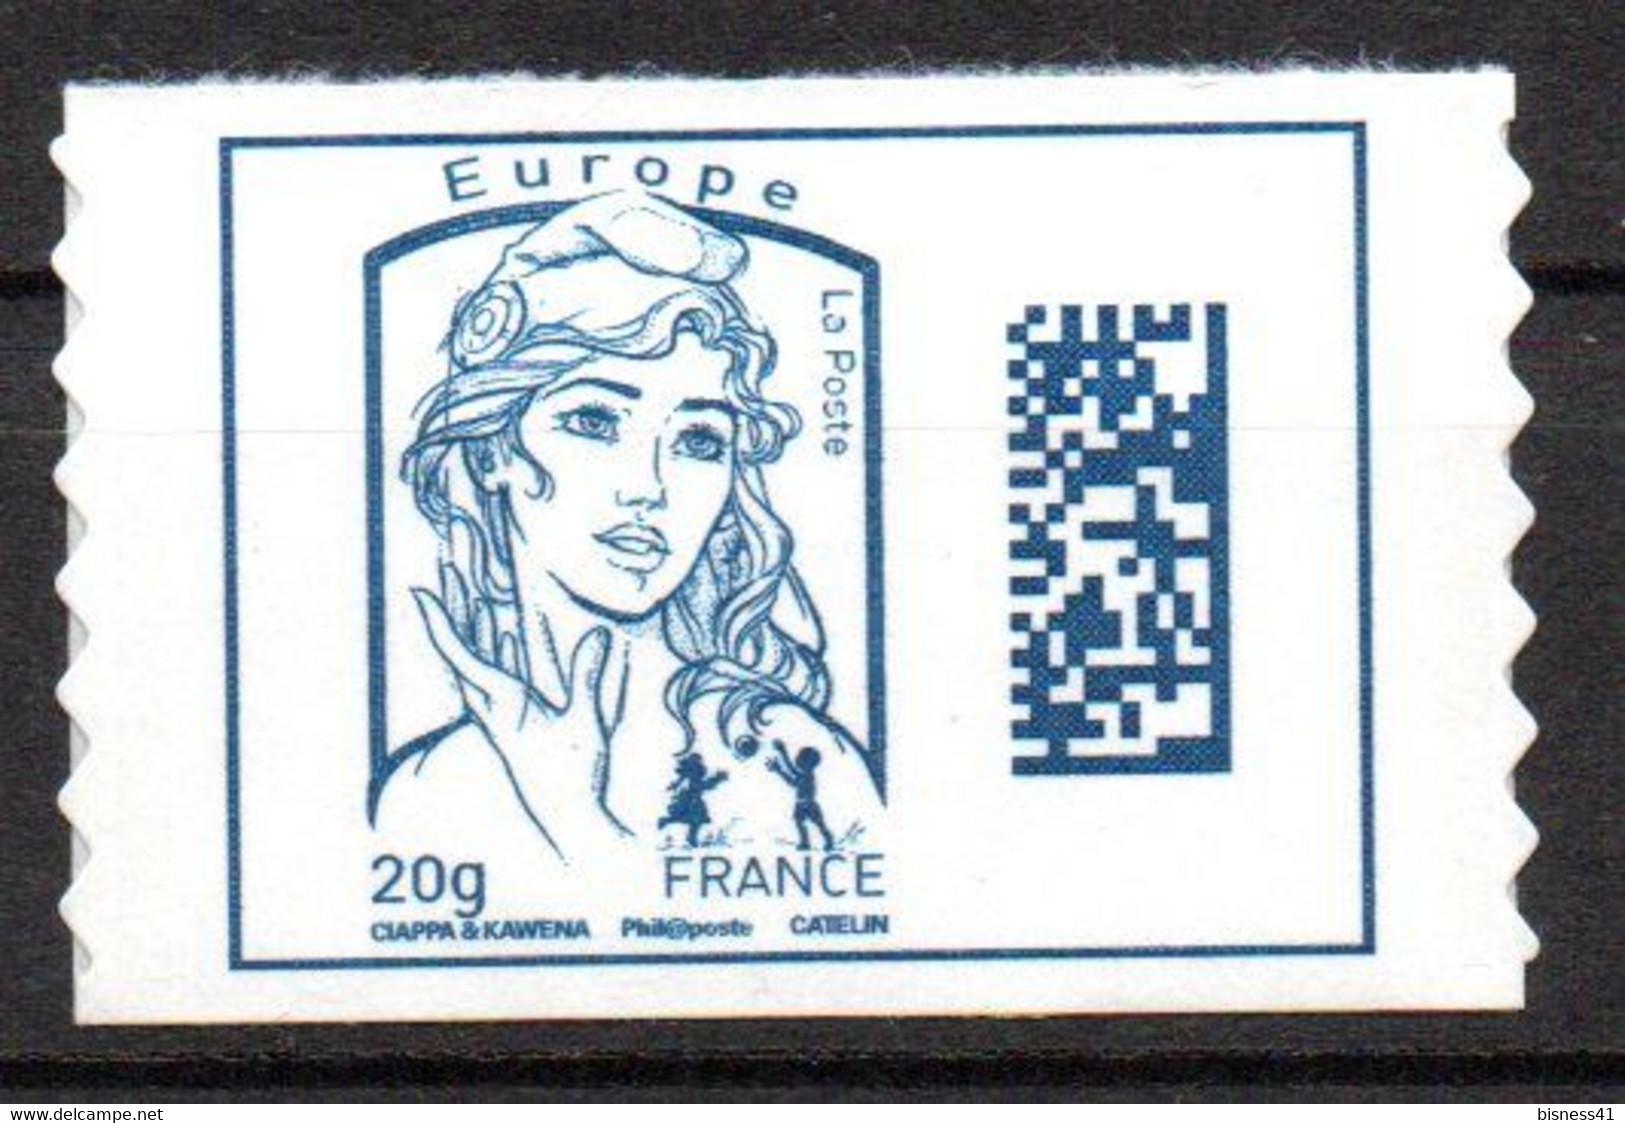 France Auto Adhésifs N° 1176 Neuf XX MNH  Cote : 10,00€ - Adhesive Stamps